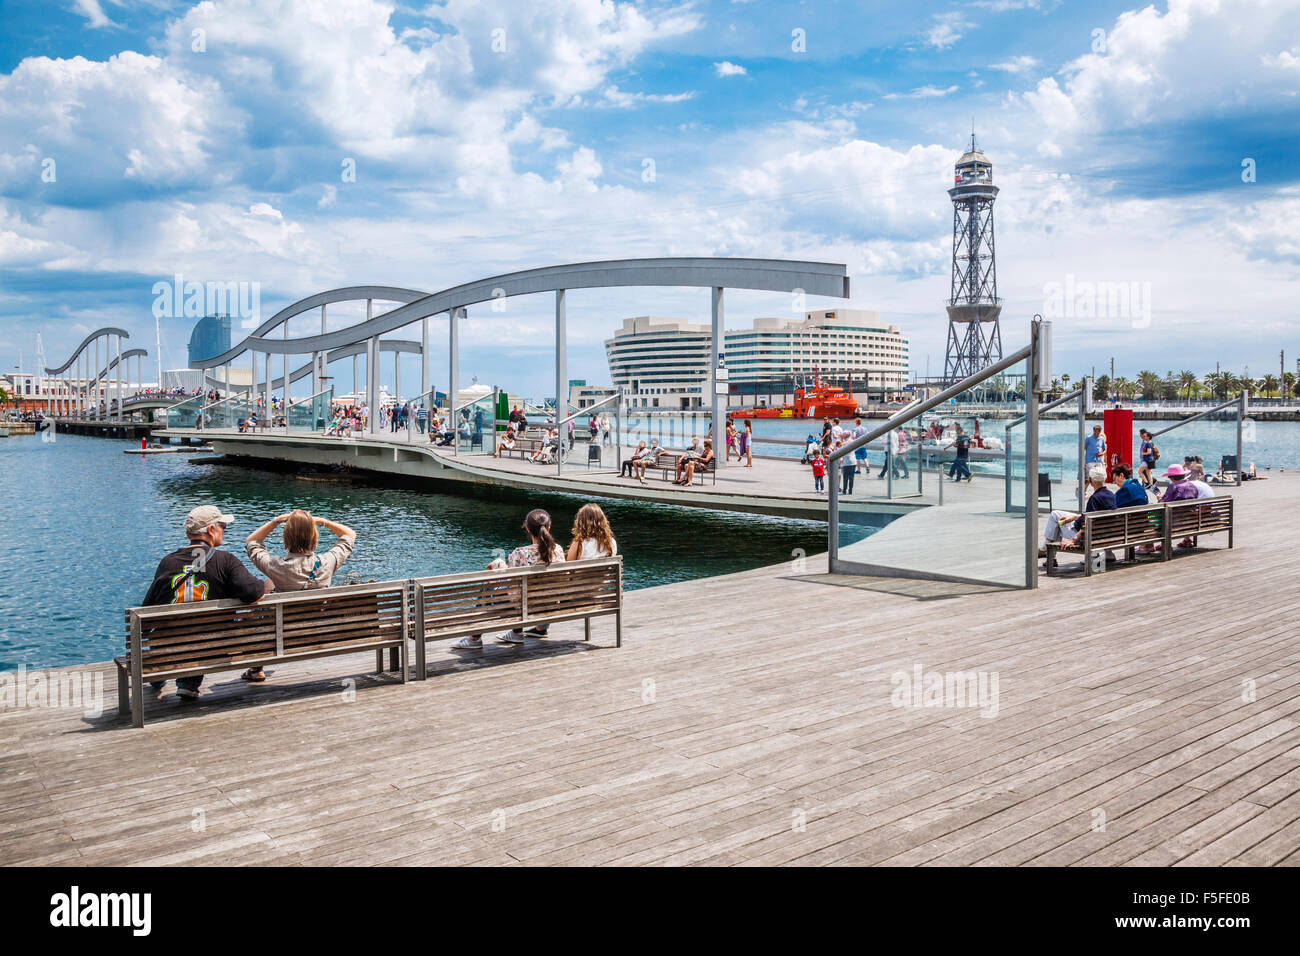 Spanien, Katatonie, Barcelona, Port Vell, Rambla del Mar, Stockbild